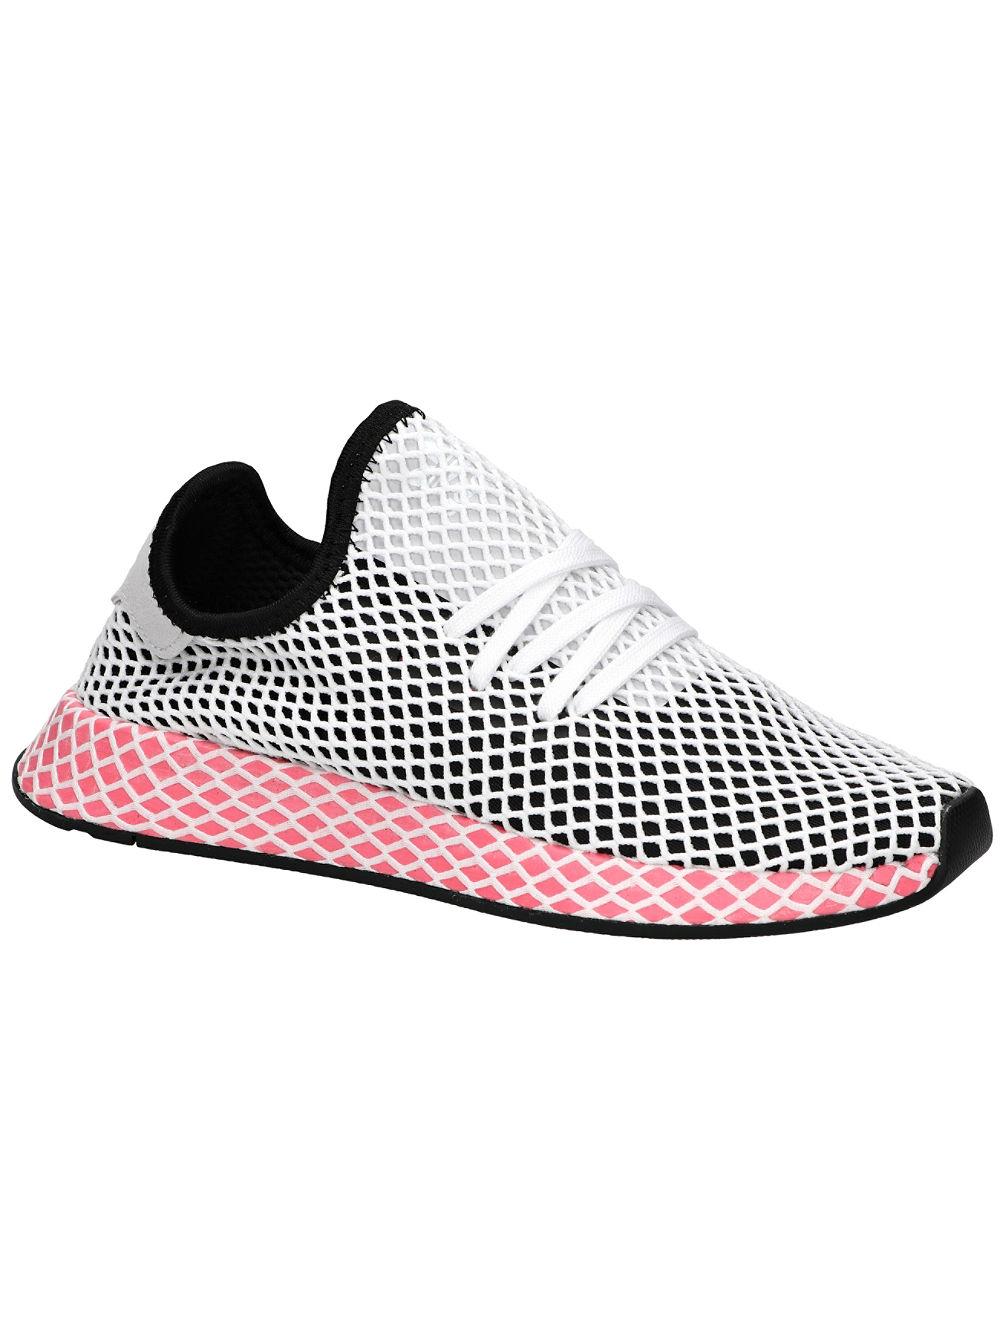 0f248bc042 Buy adidas Originals Deerupt Sneakers online at Blue Tomato